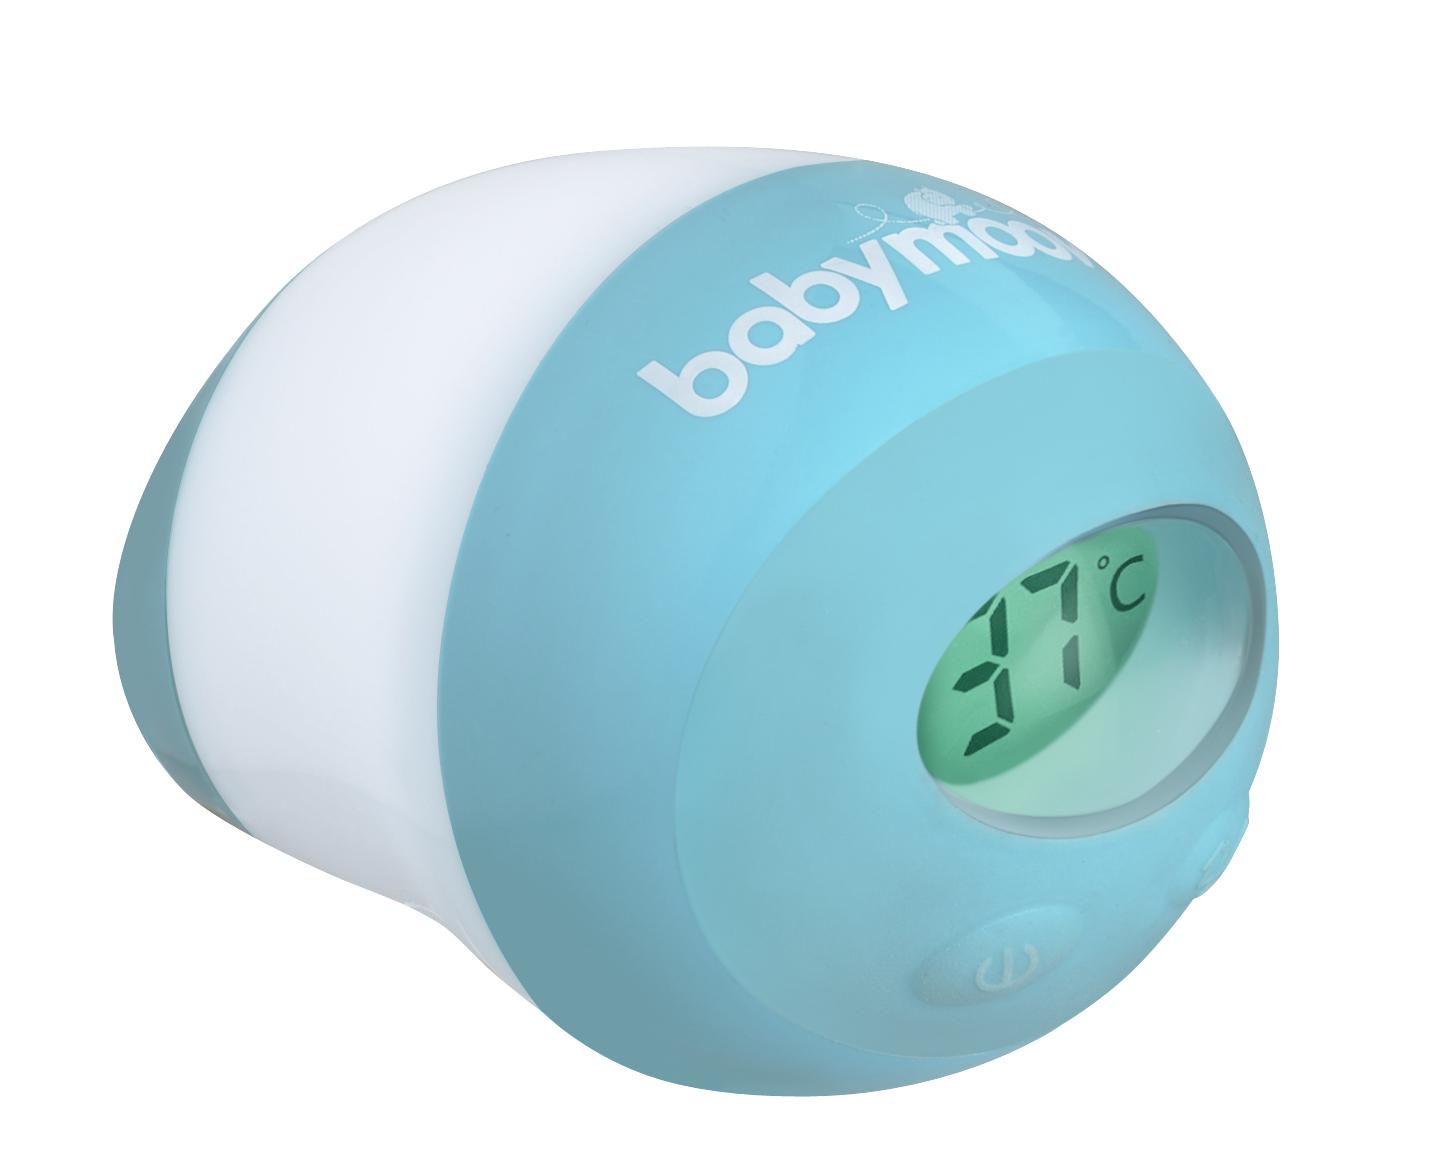 babymoov Badethermometer Aqualight